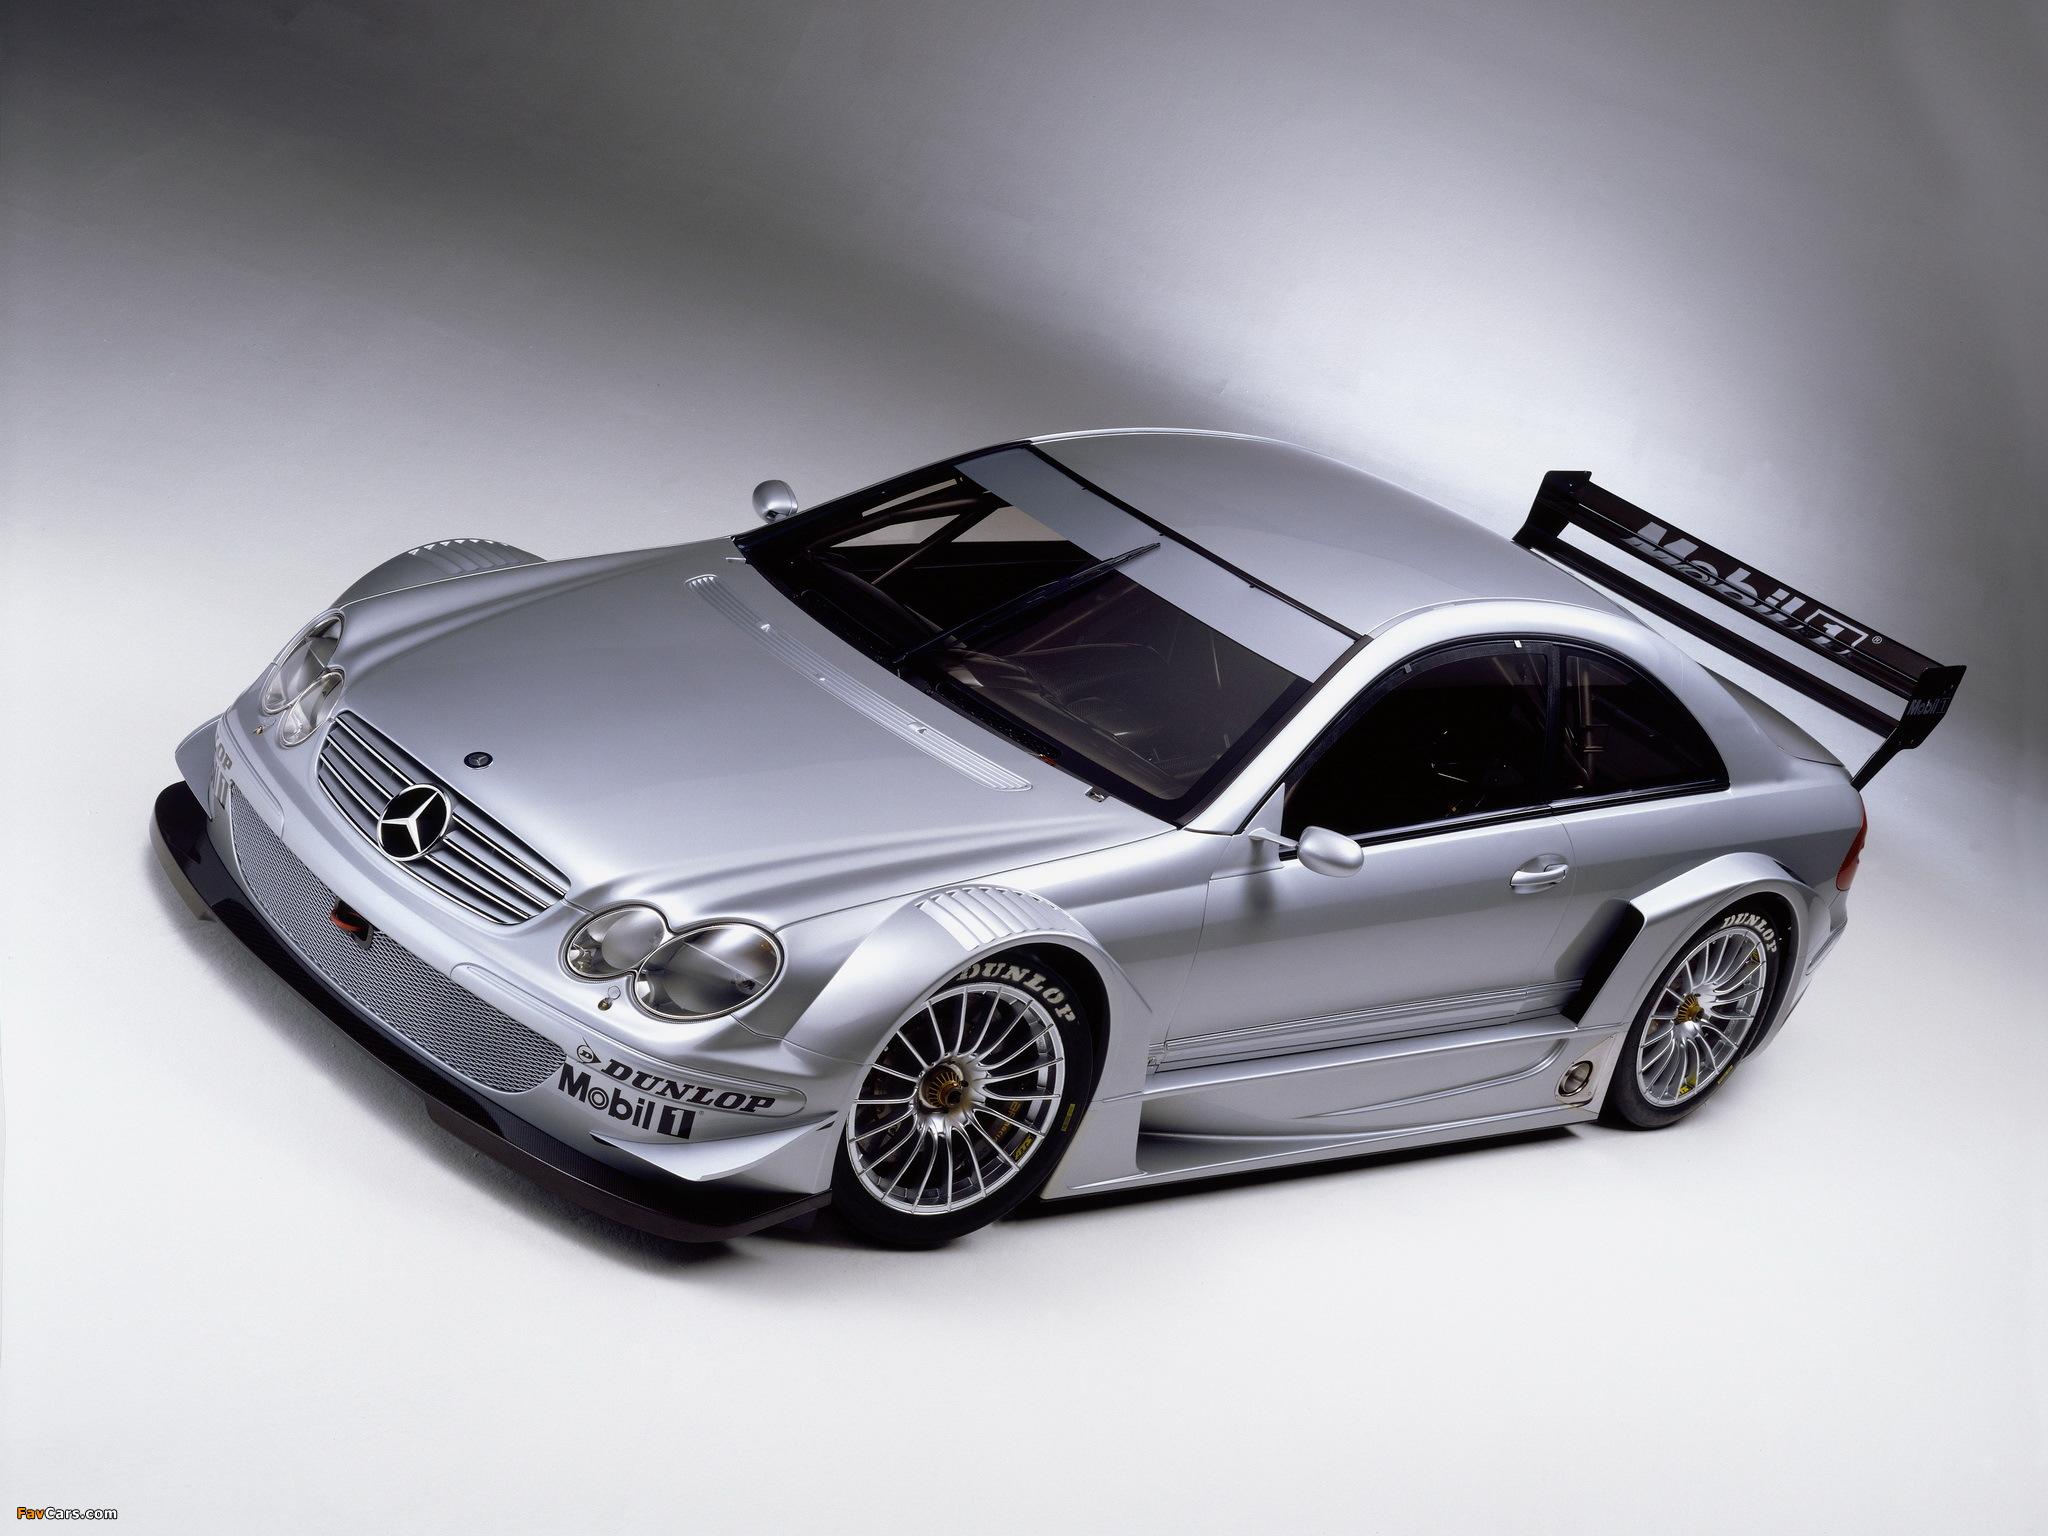 Mercedes-Benz CLK 55 AMG DTM (C209) 2003 pictures (2048 x 1536)